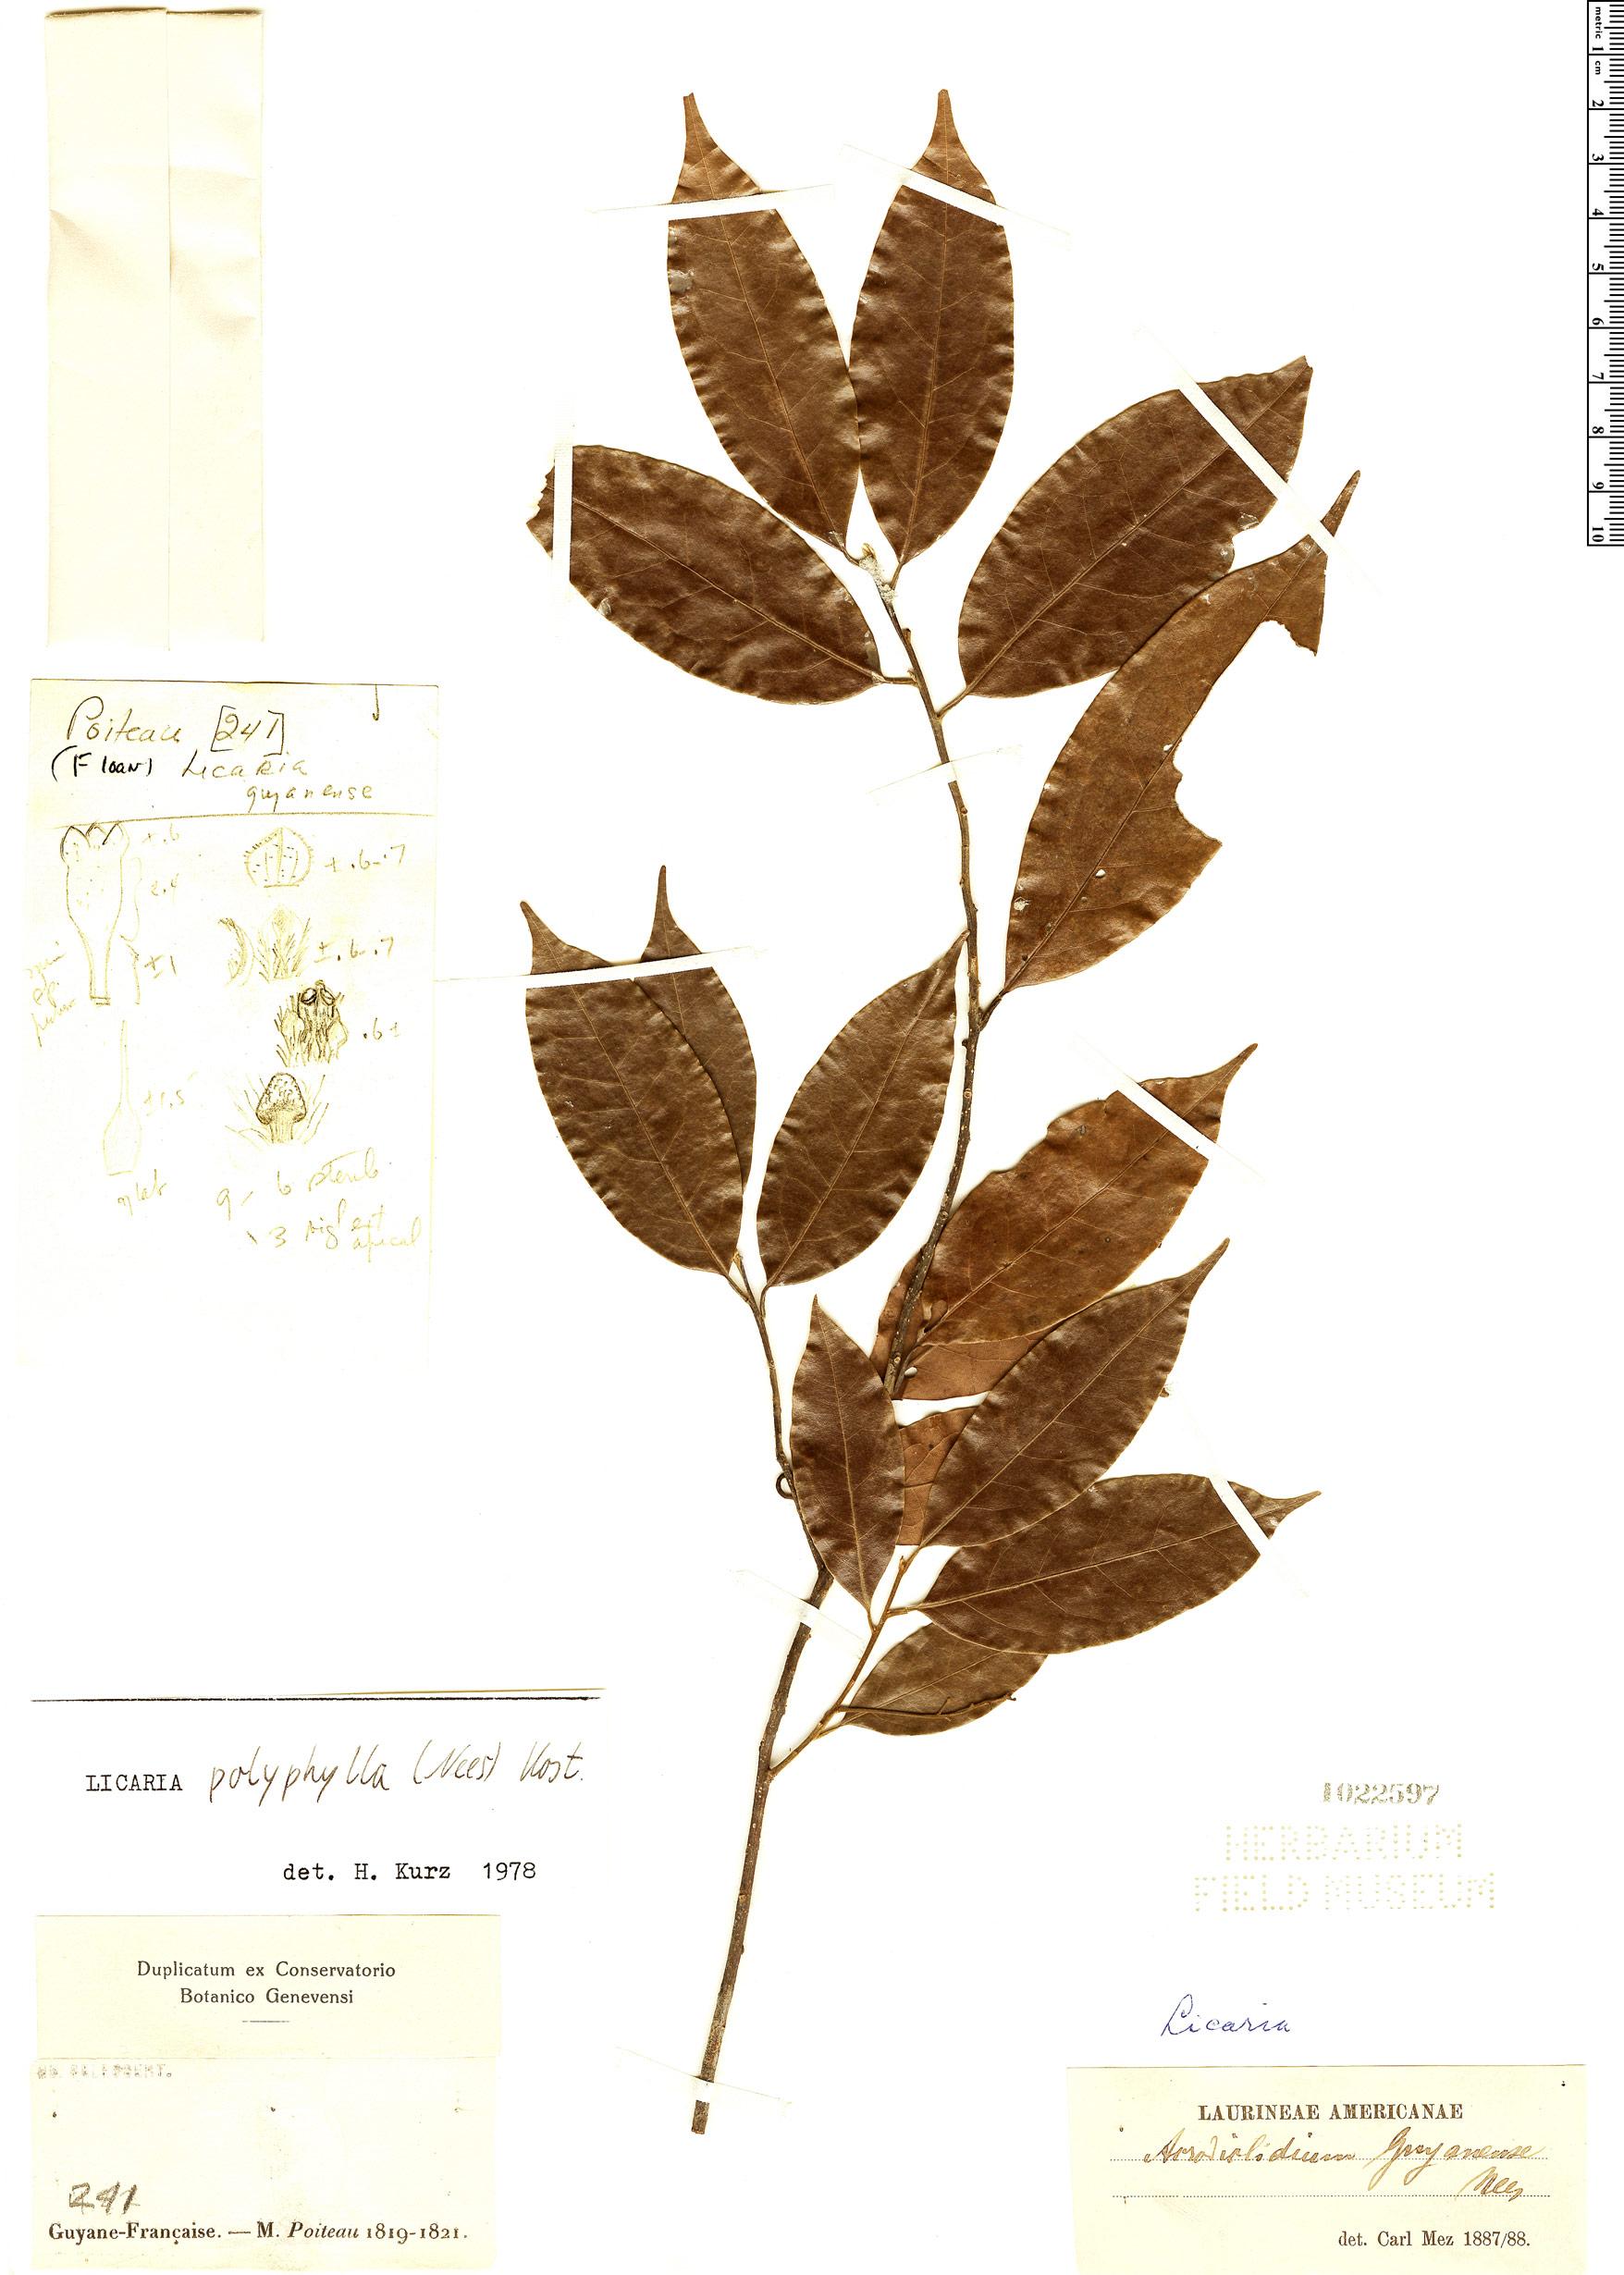 Specimen: Licaria polyphylla